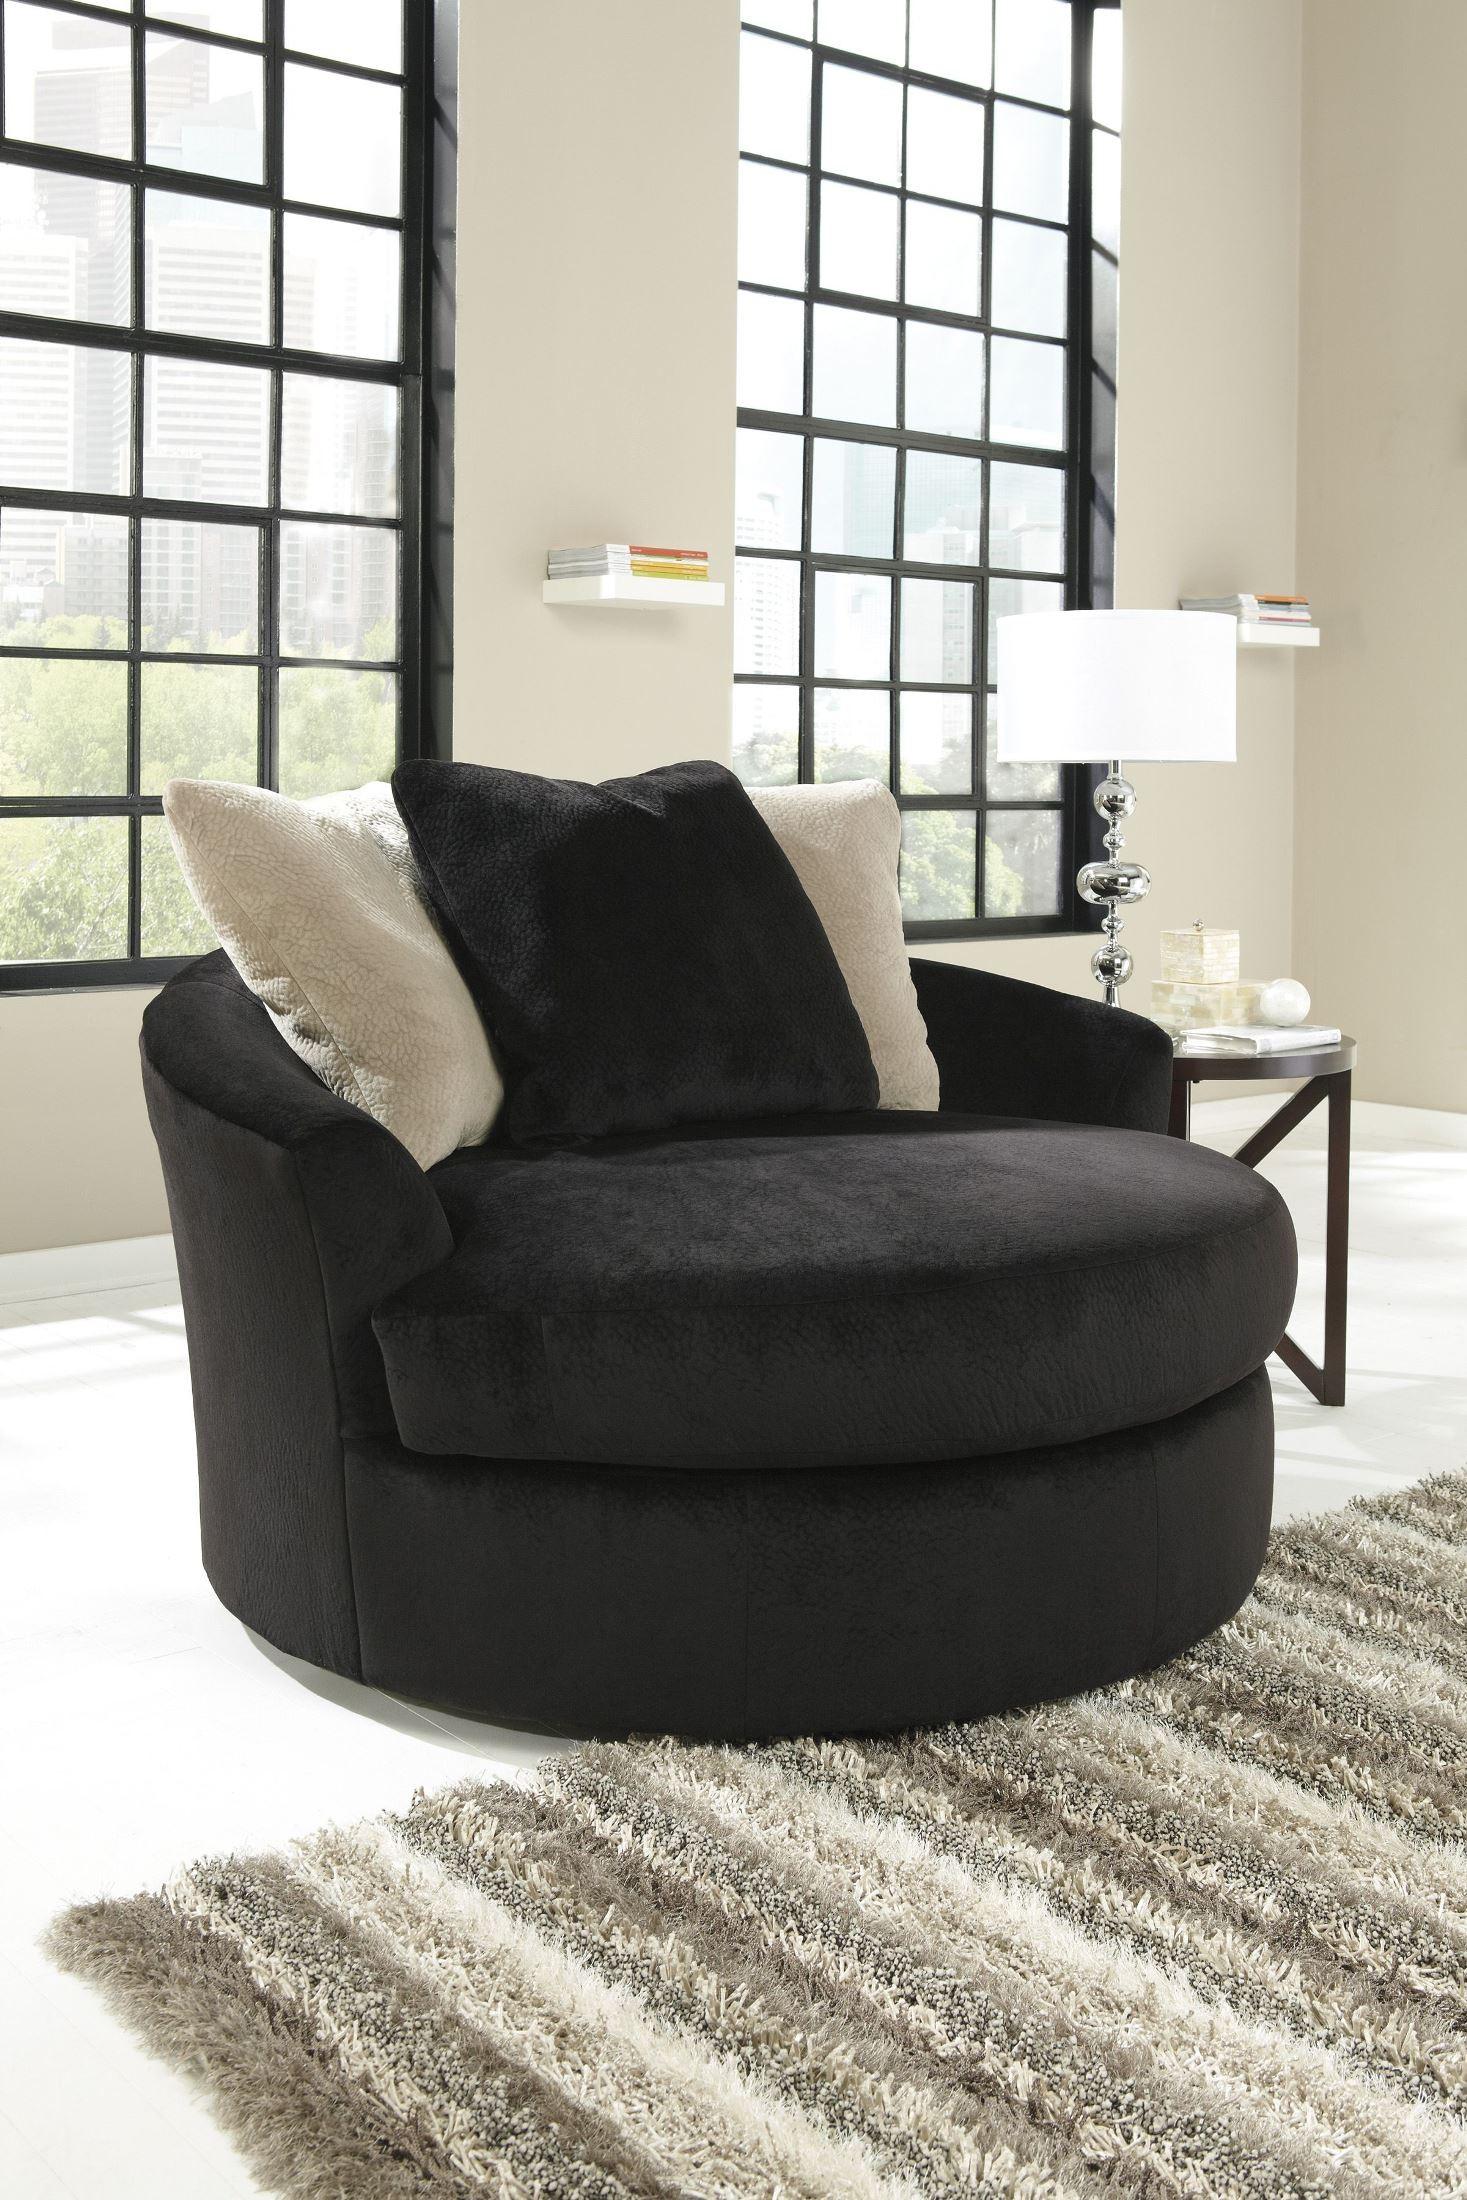 Ashley oversized swivel accent chair - Heflin Ebony Oversized Swivel Accent Chair 4720021 Ashley Furniture